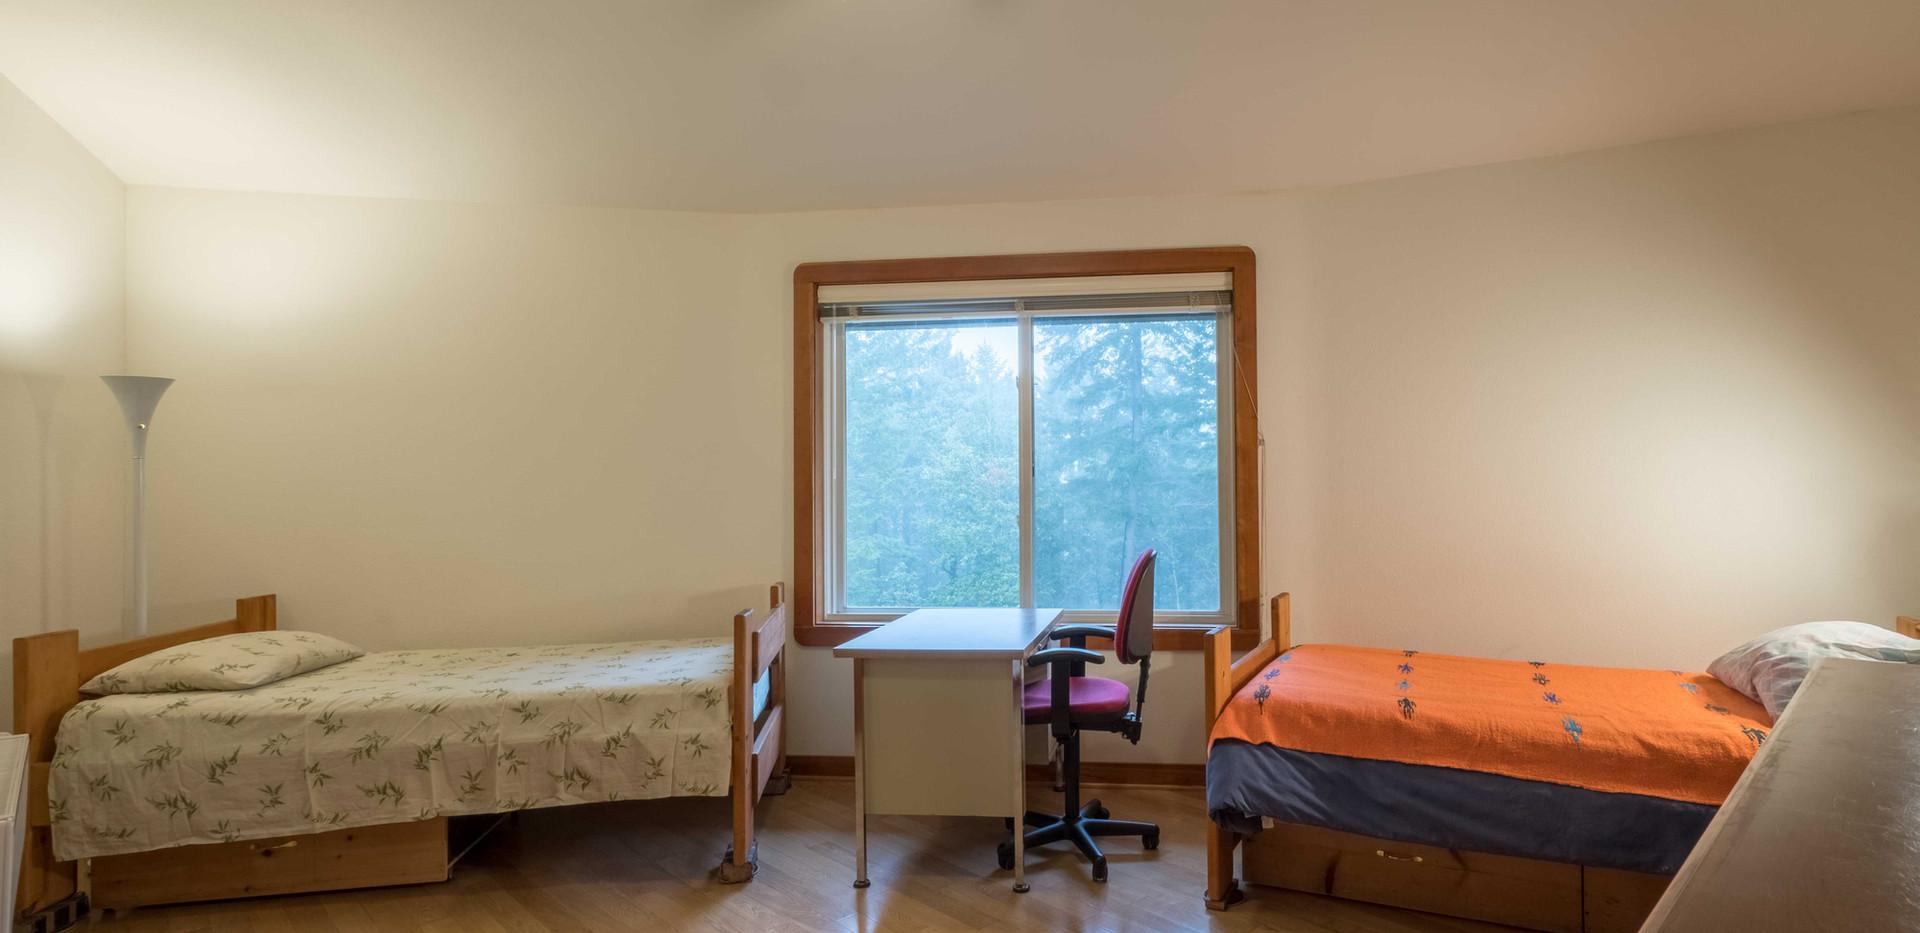 House_Room3_01.jpg